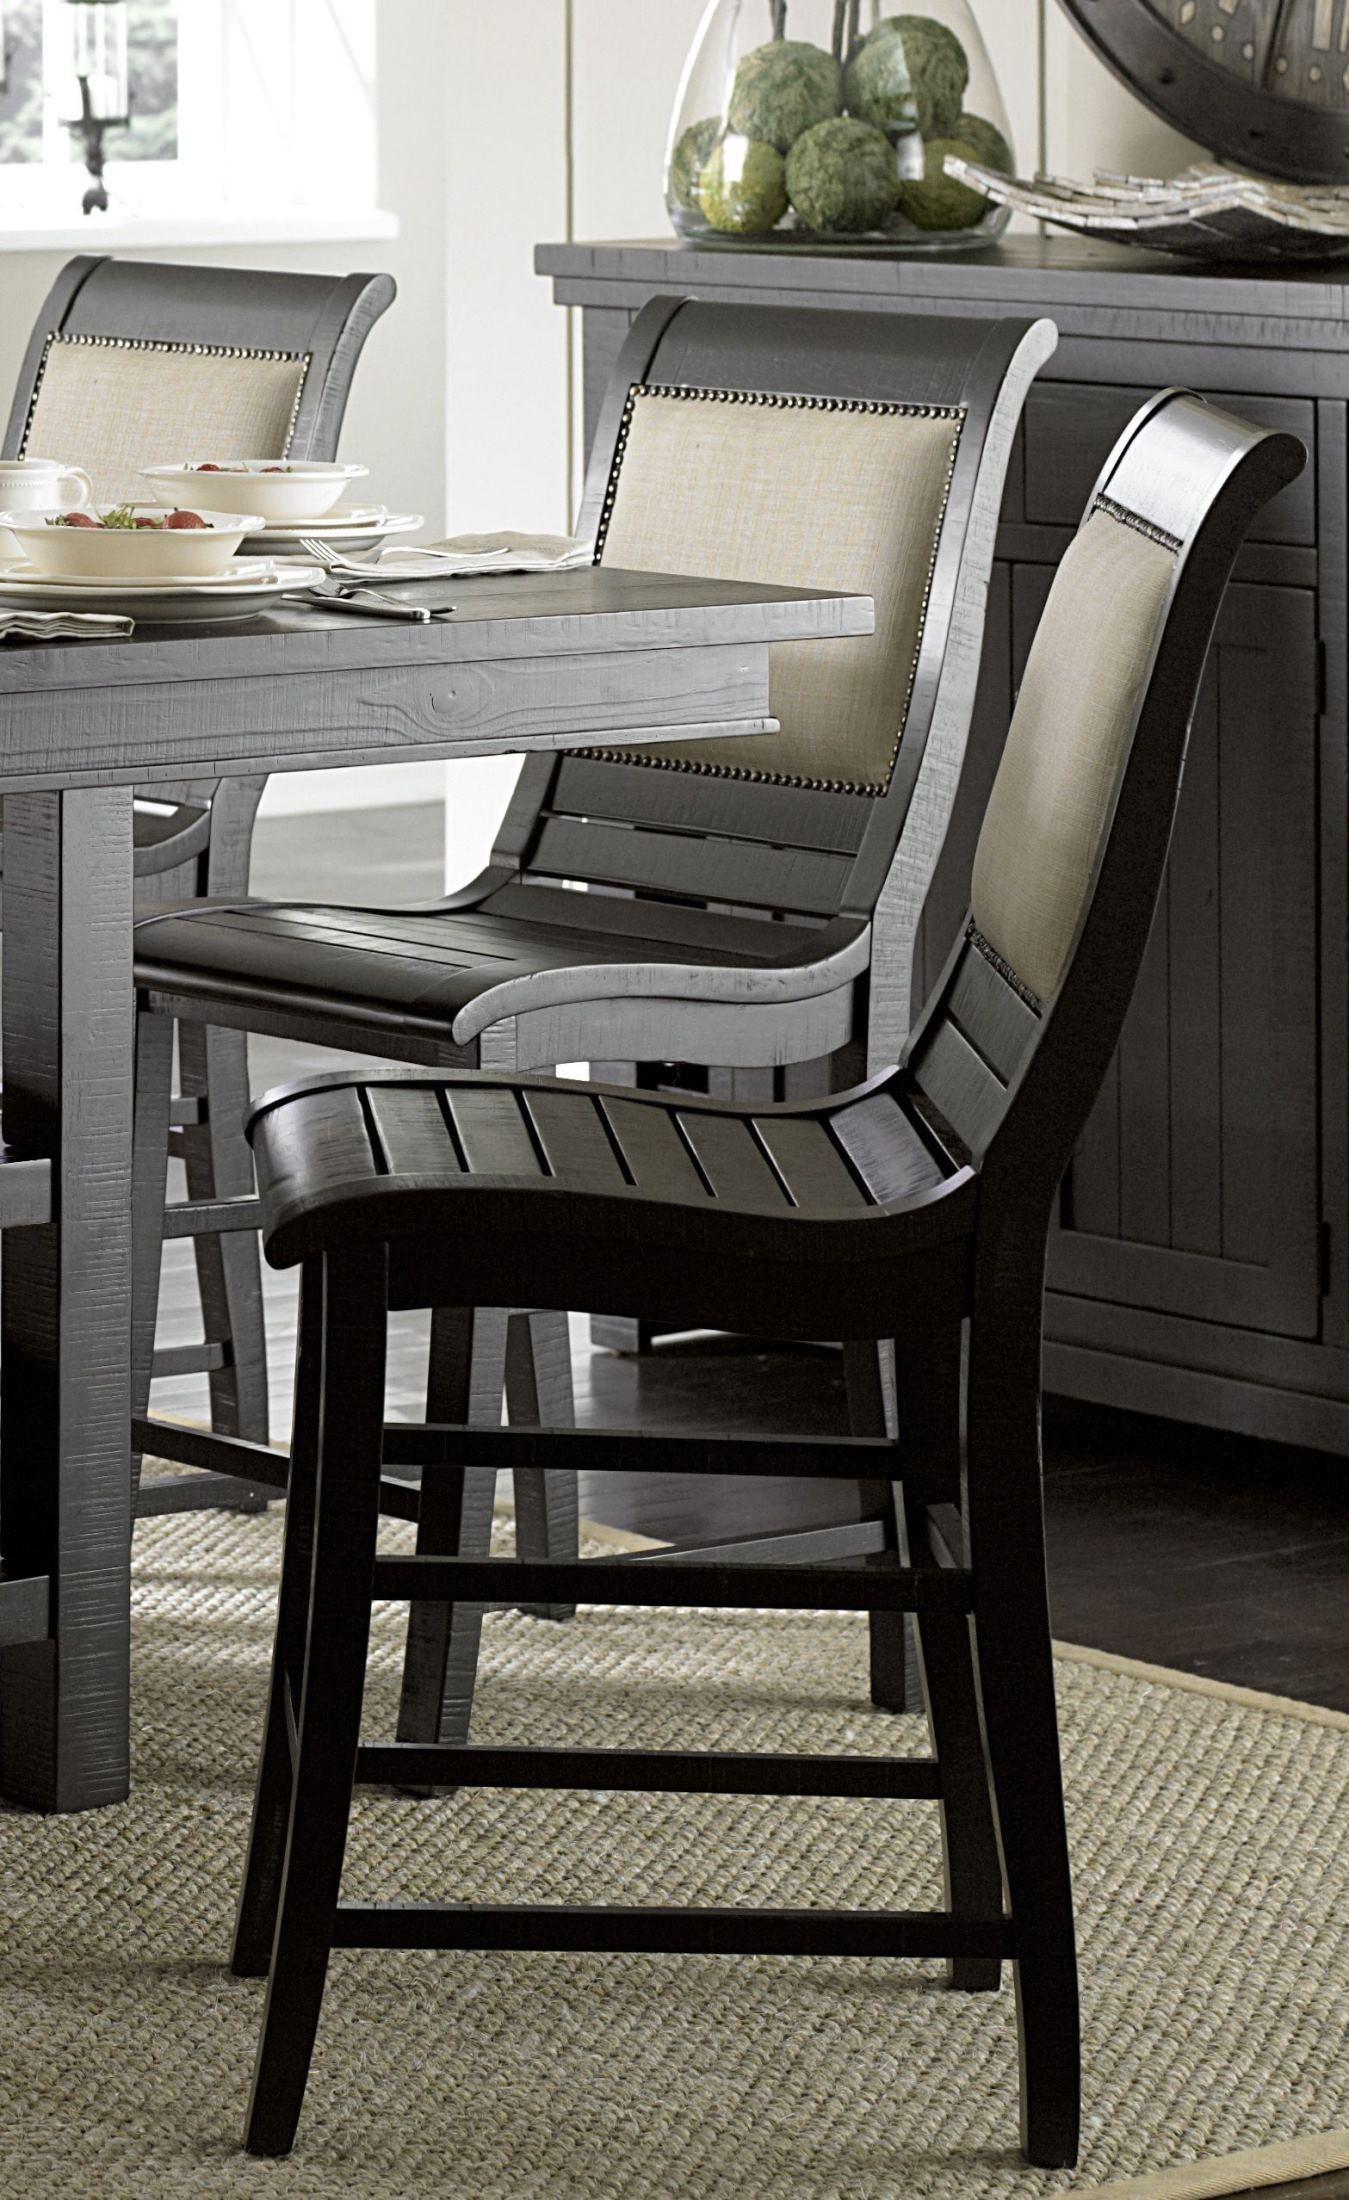 Willow Distressed White Slat Bedroom Set: Progressive Furniture Willow Distressed Black Rectangular